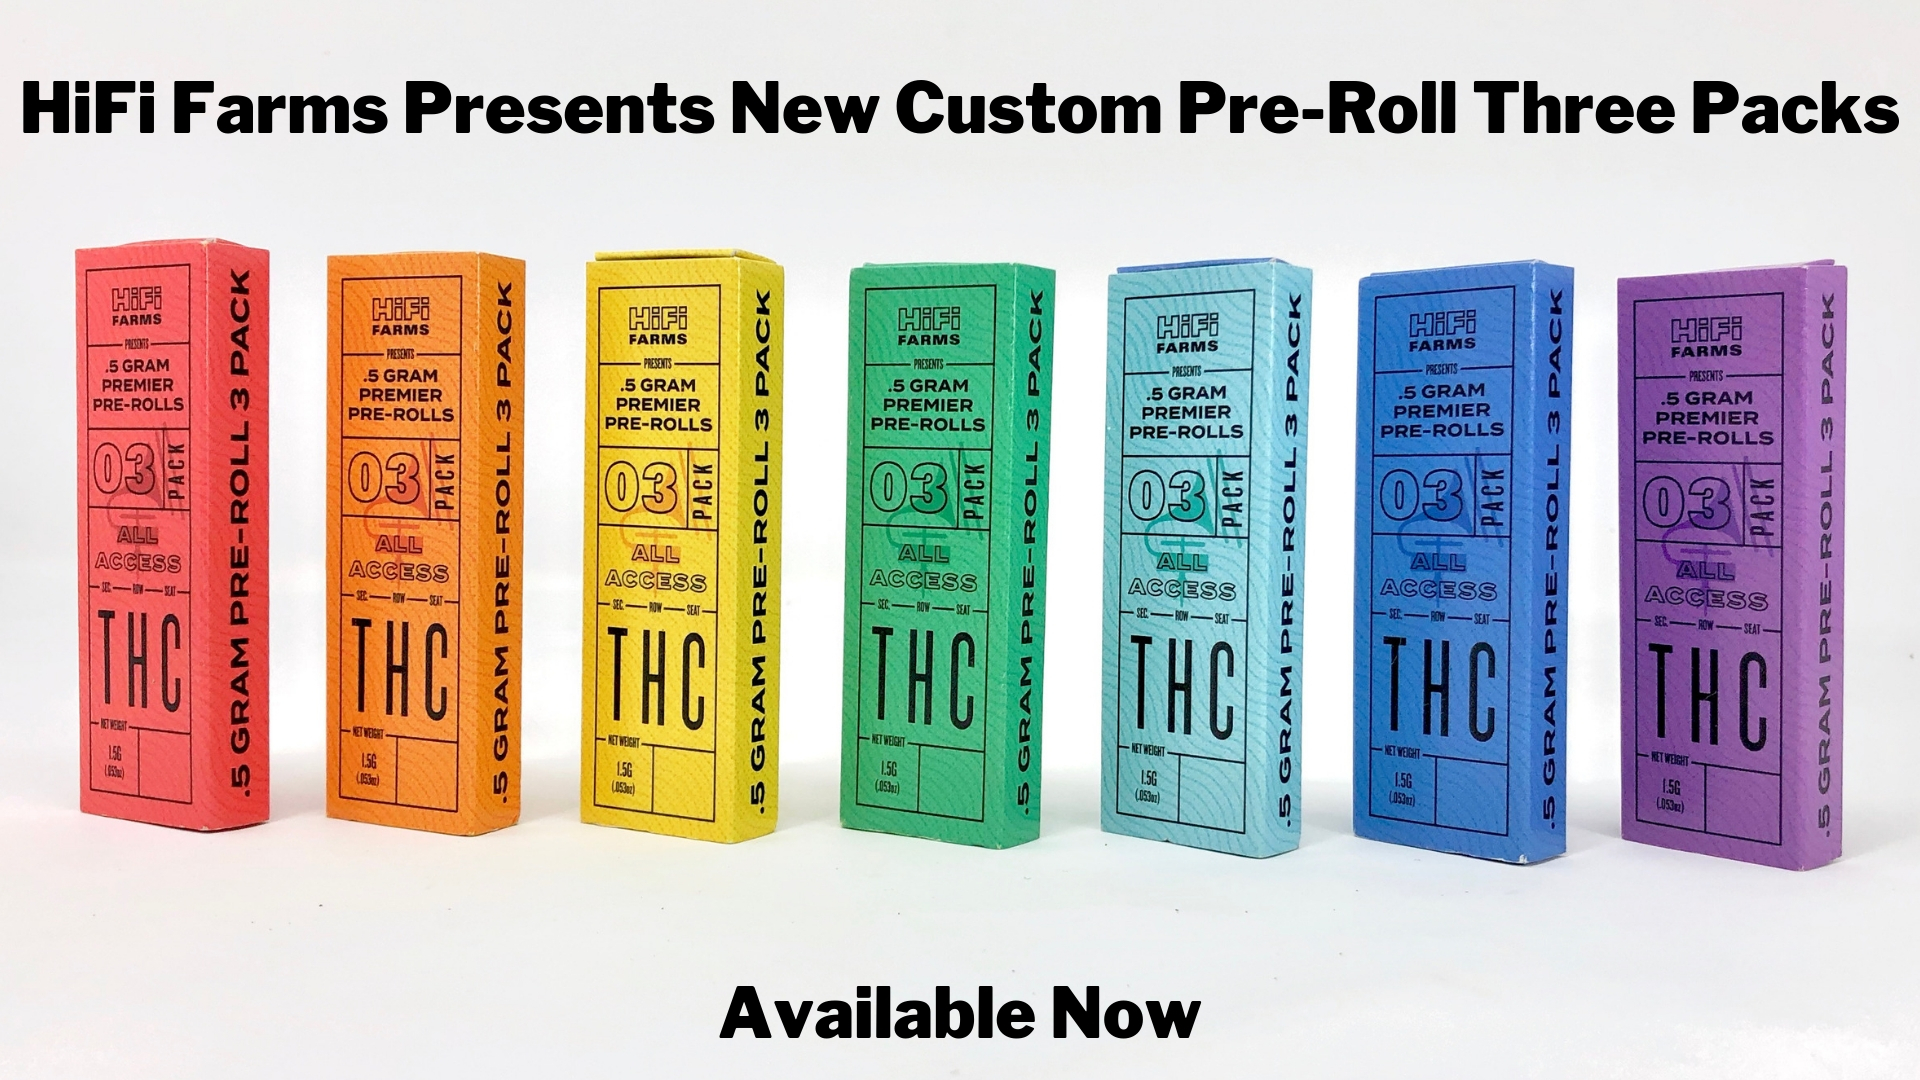 HiFi Farms Presents New Custom Pre-Roll Three Packs-2.jpg